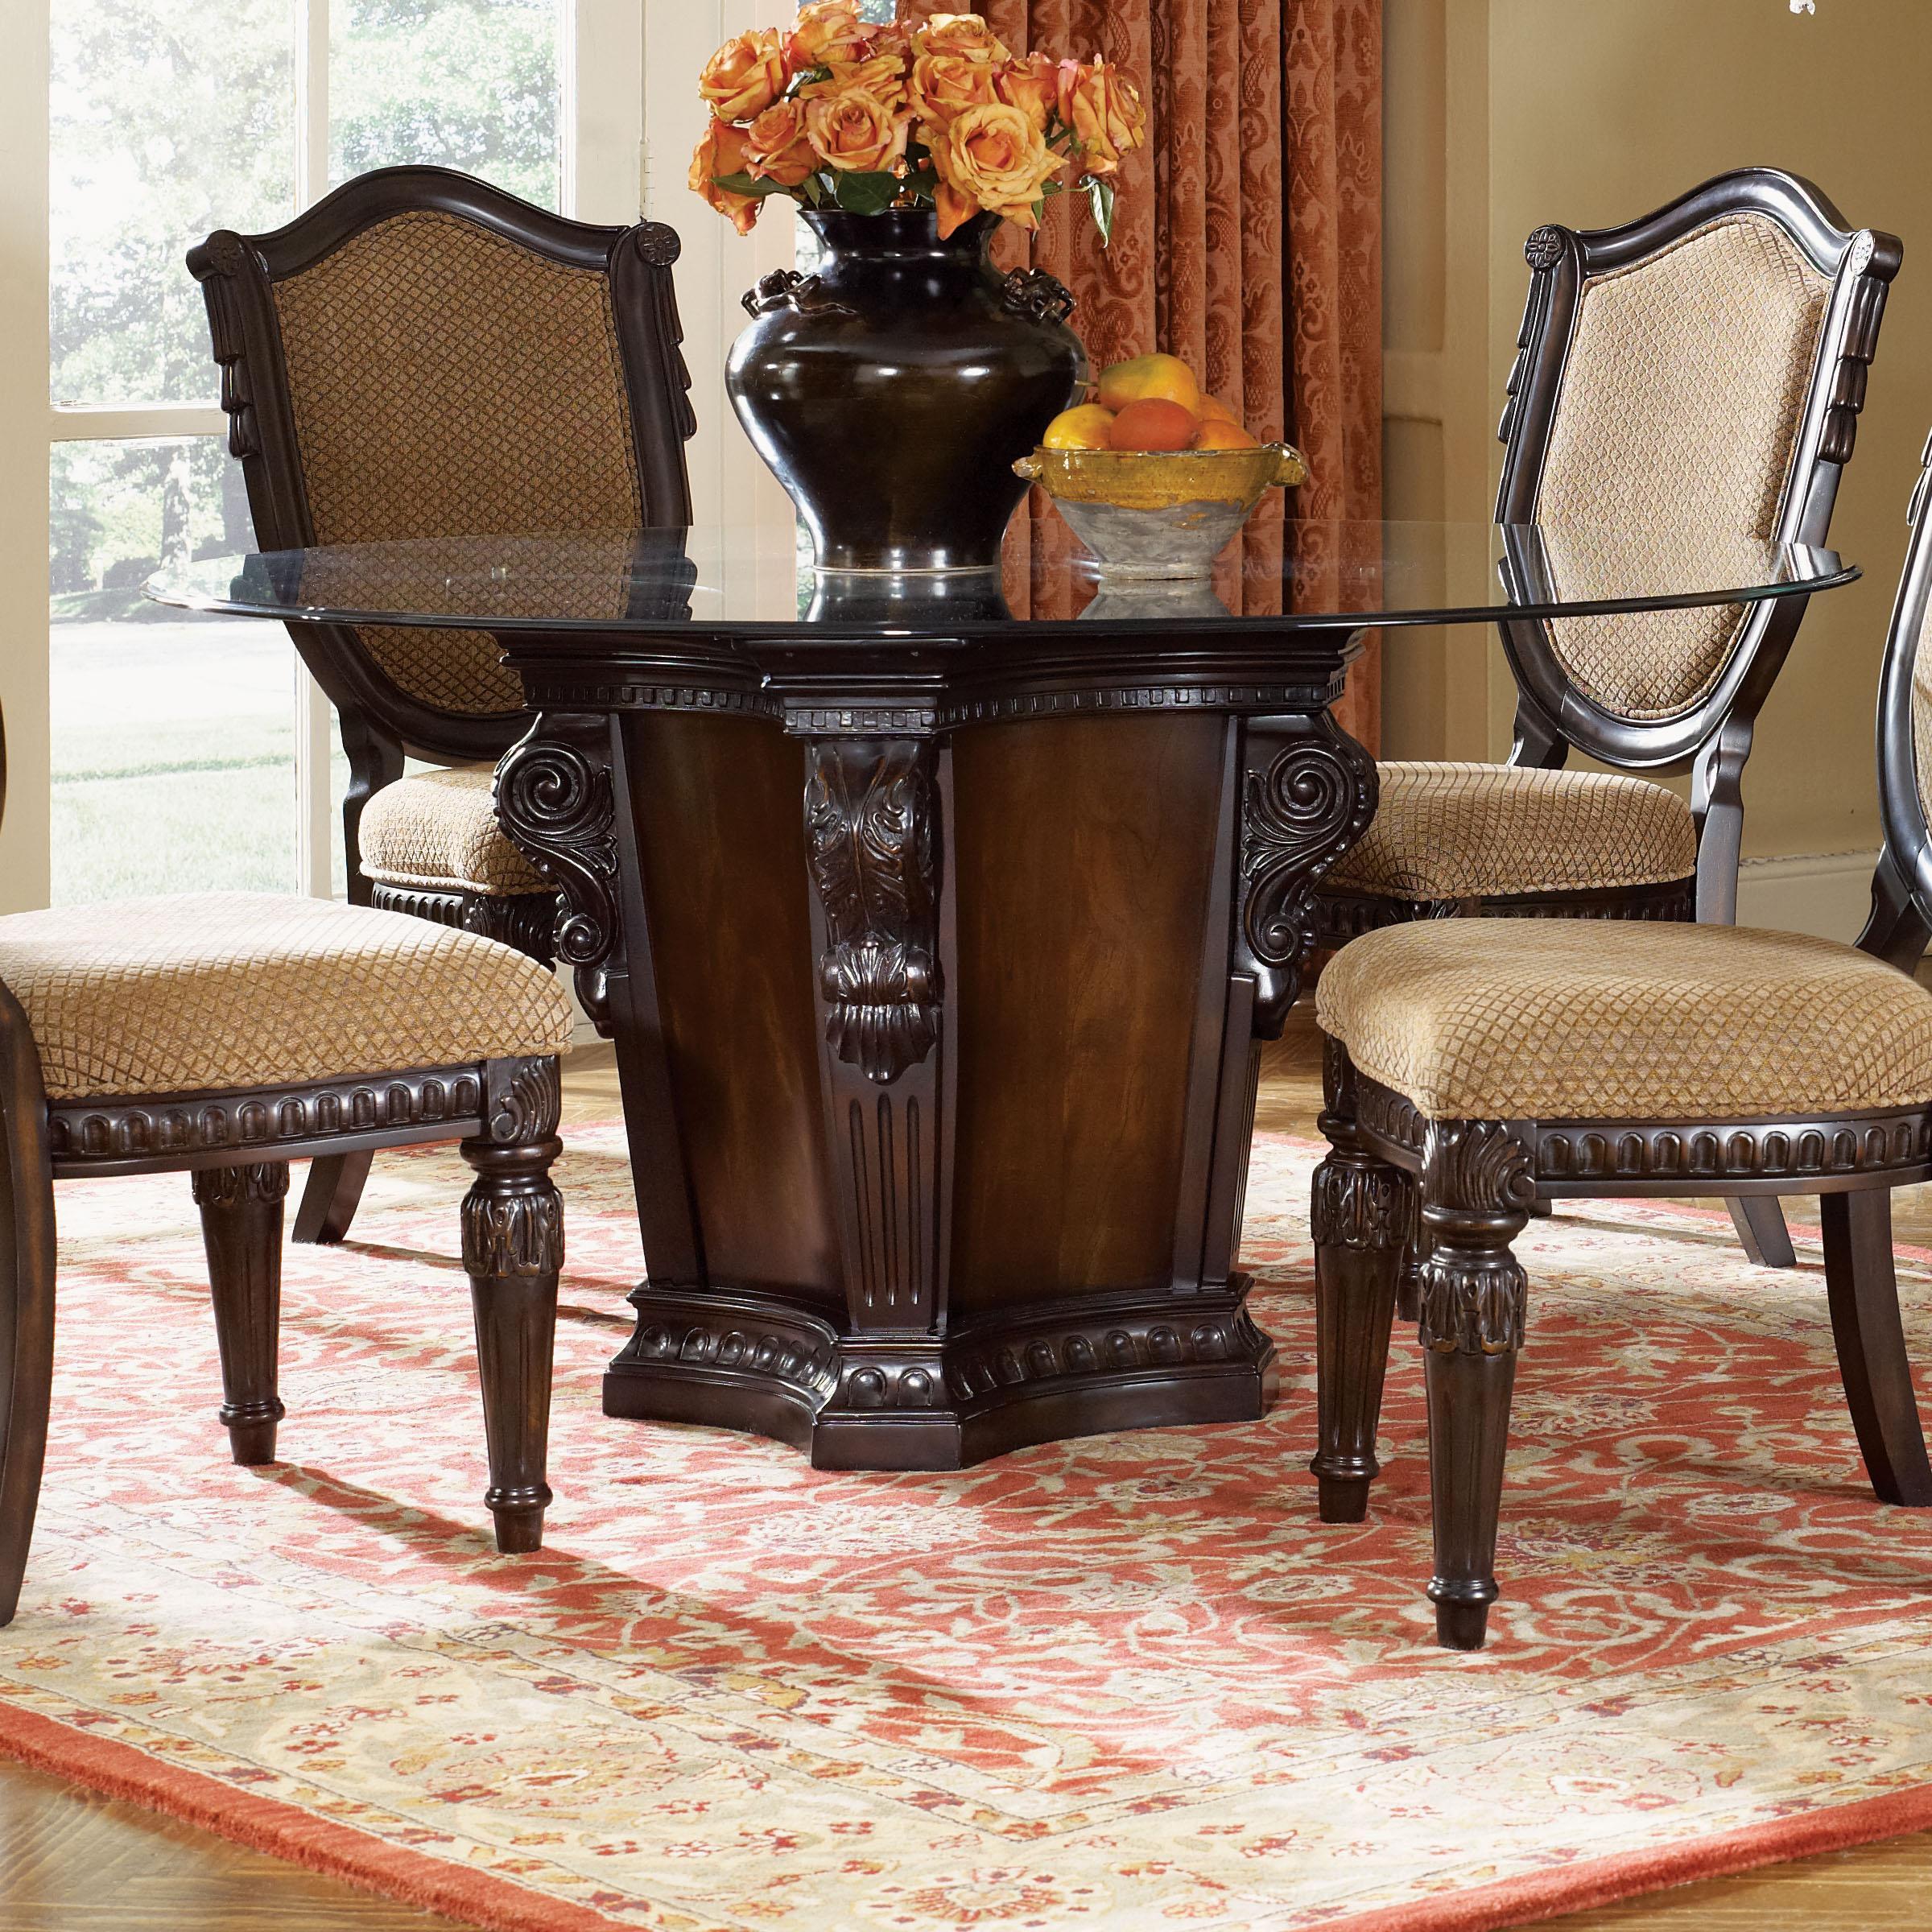 Fairmont designs grand estates round pedestal dinner table for Fairmont designs dining room